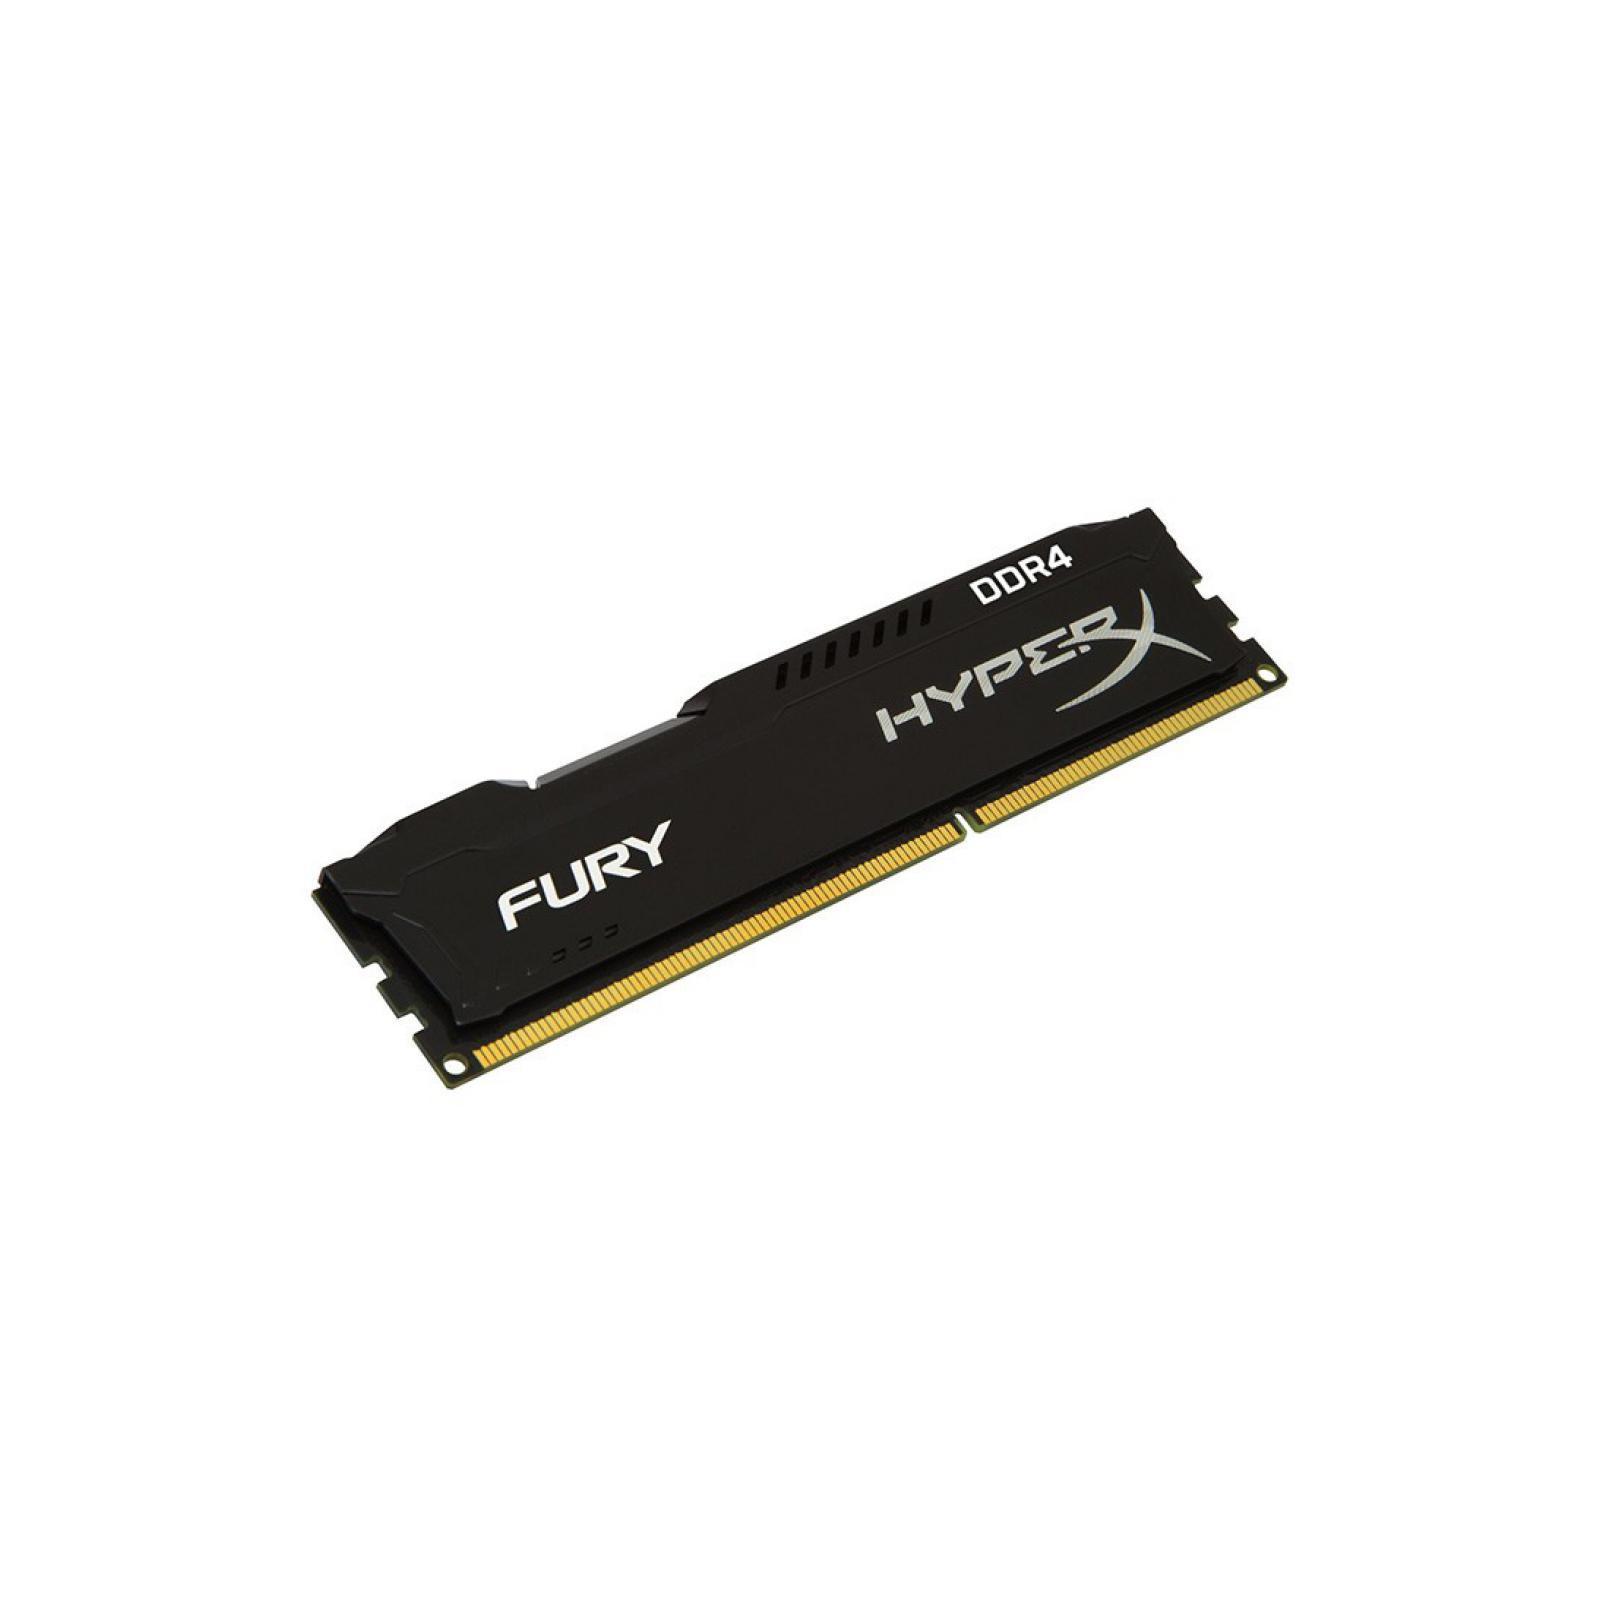 Модуль памяти для компьютера DDR4 8GB 3466 MHz HyperX FURY Black HyperX (Kingston Fury) (HX434C19FB2/8) изображение 2